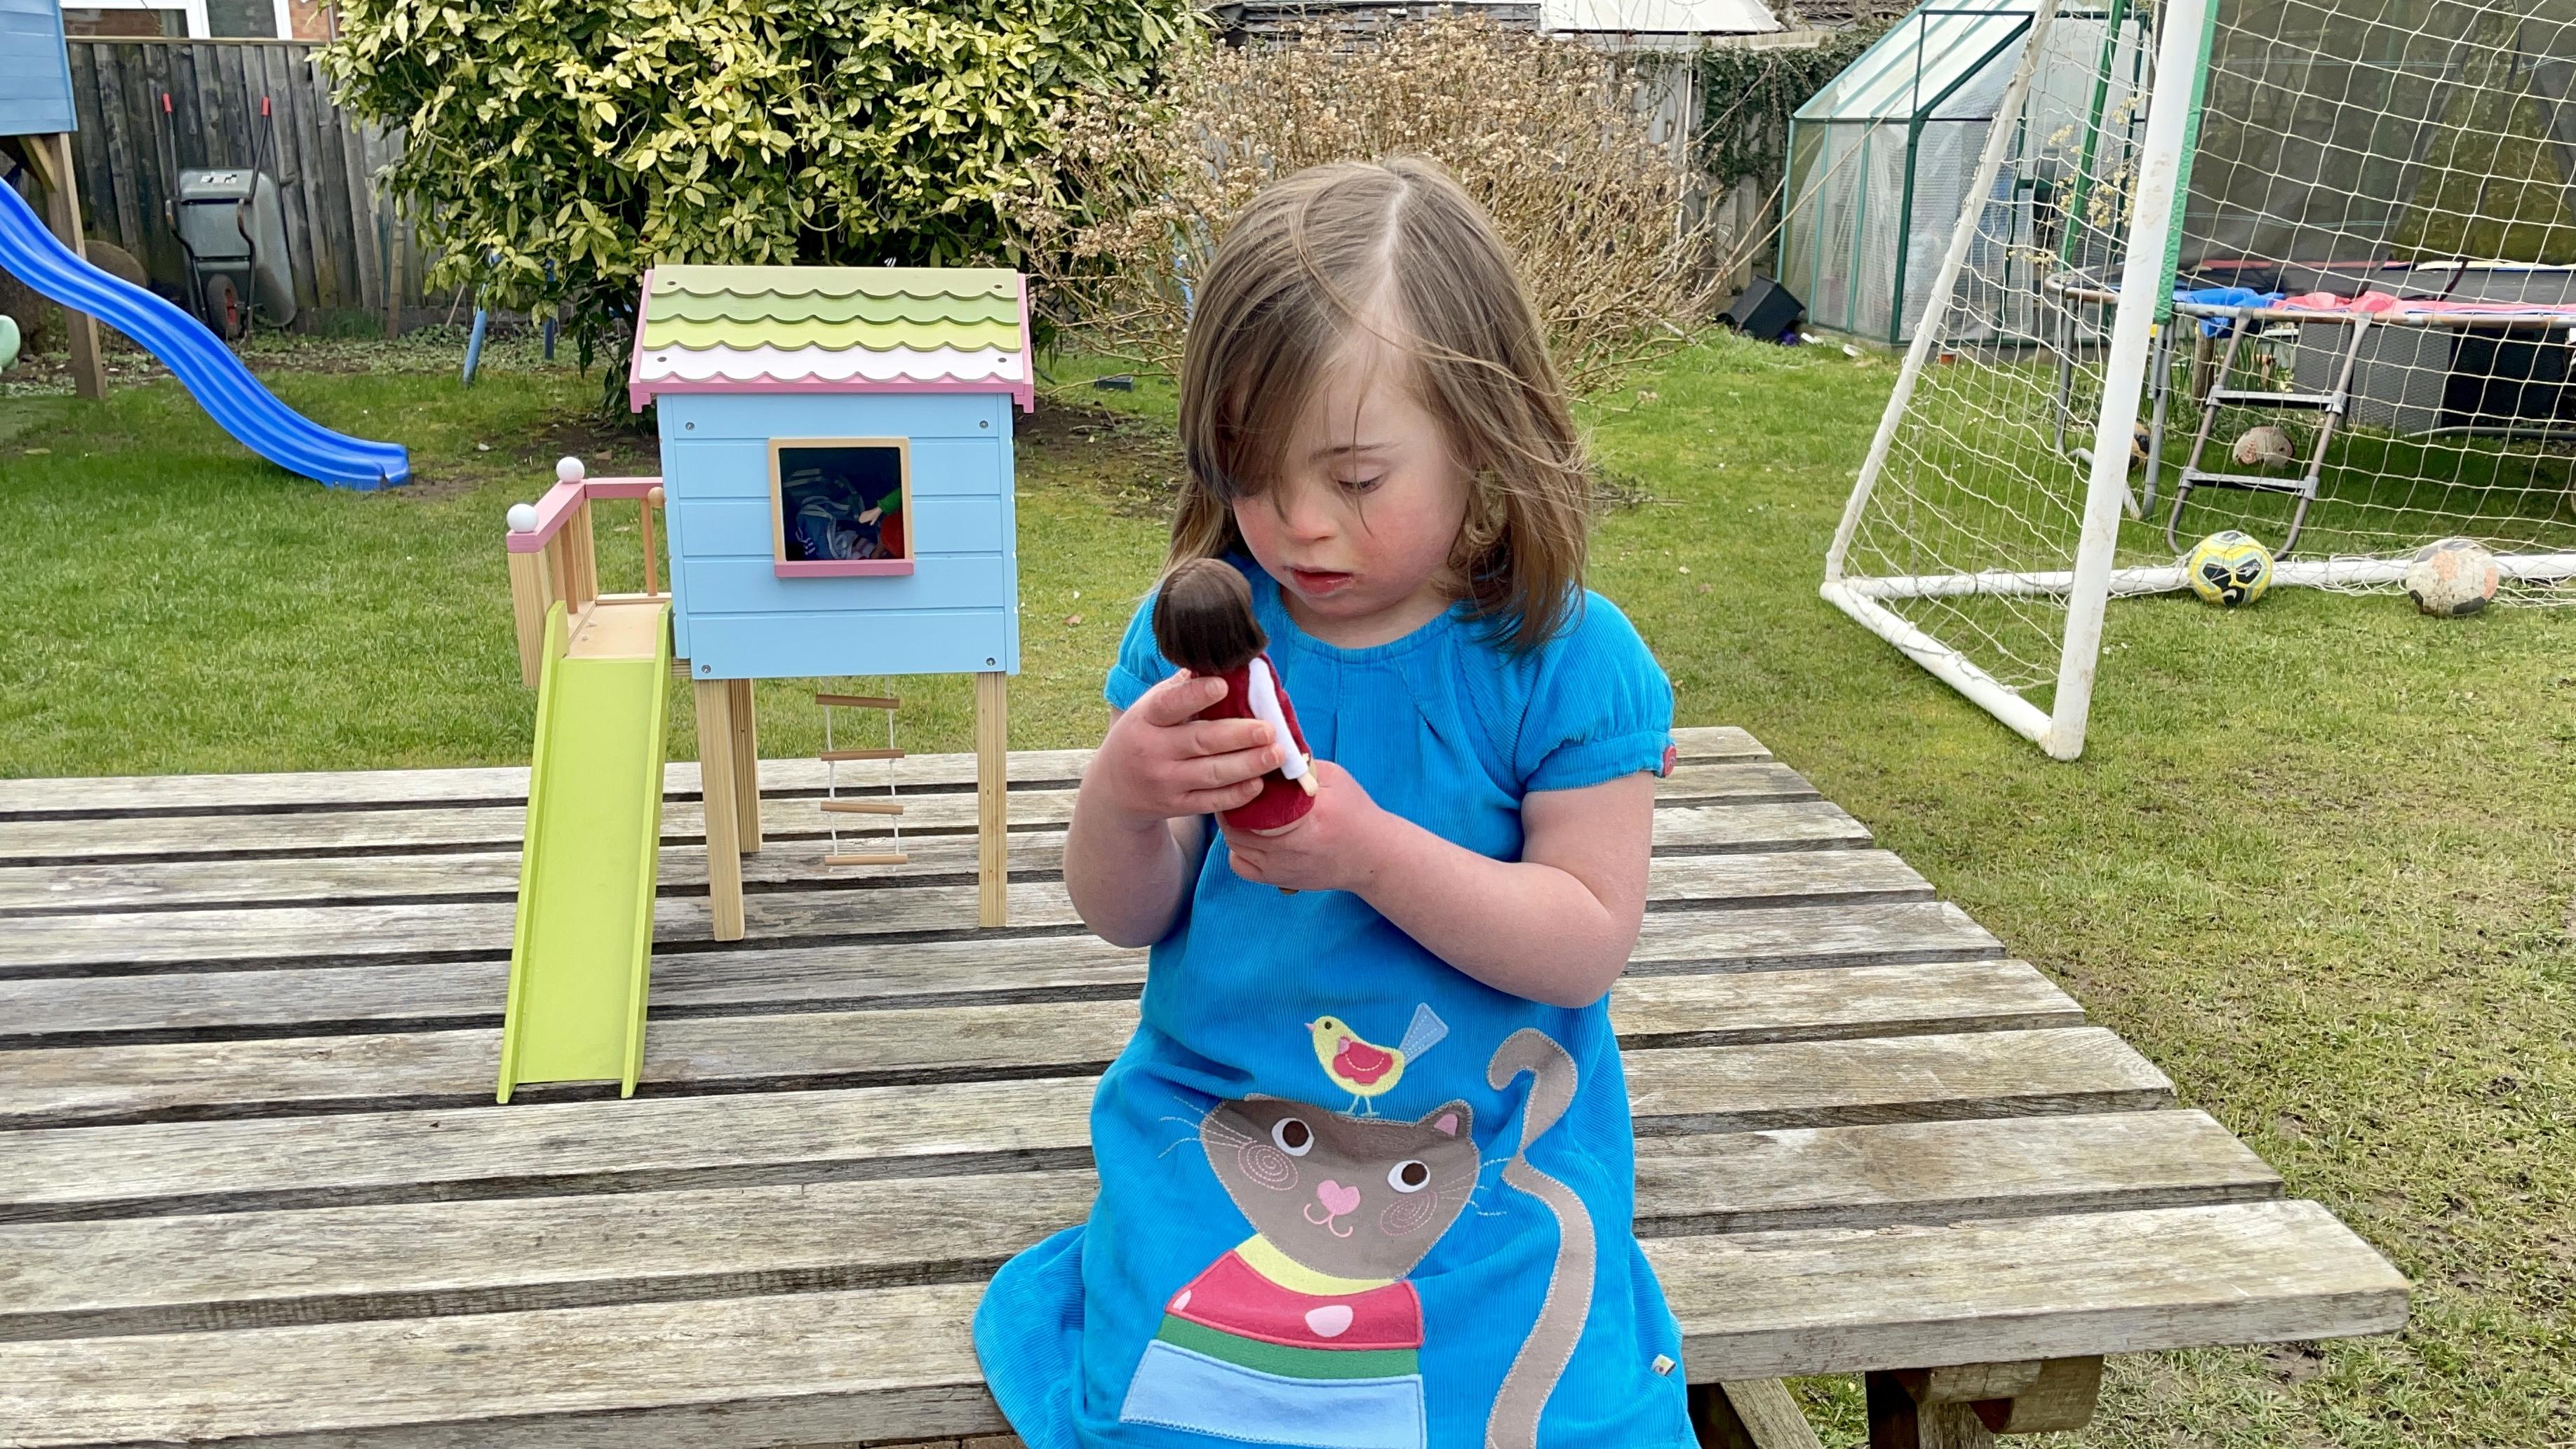 Rosie Barnett, 6, with a new Lottie Dolls toy